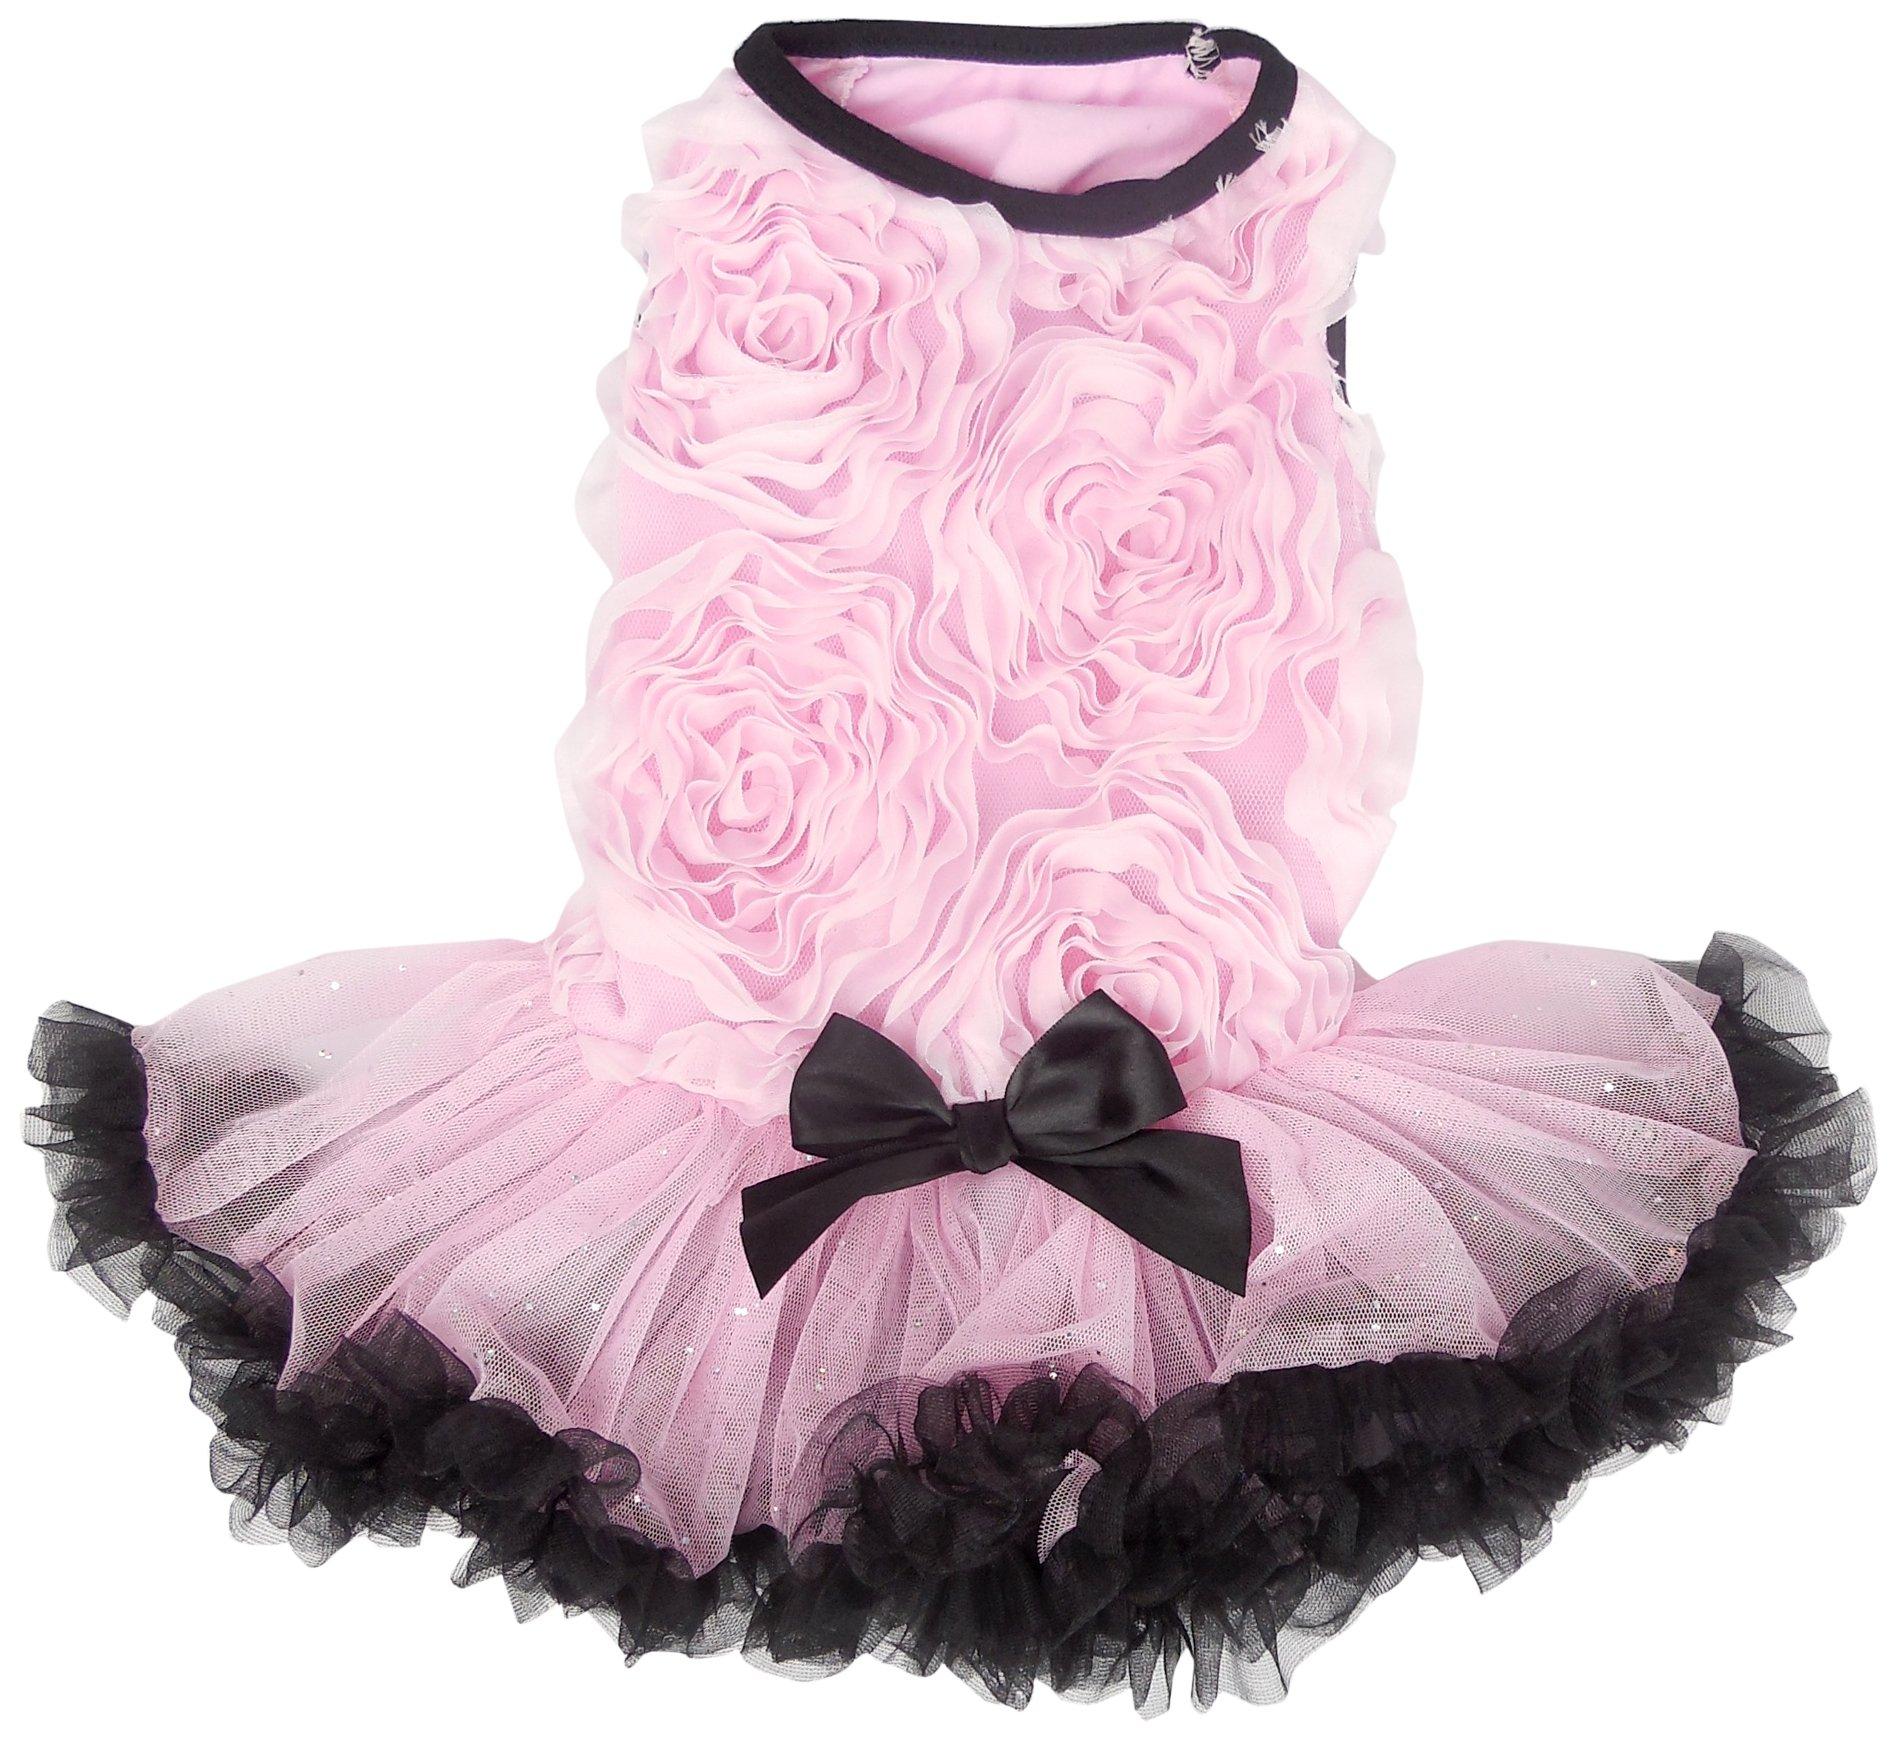 PAWPATU Soutache Ruffle Dress for Dogs, Small, Pink/Black